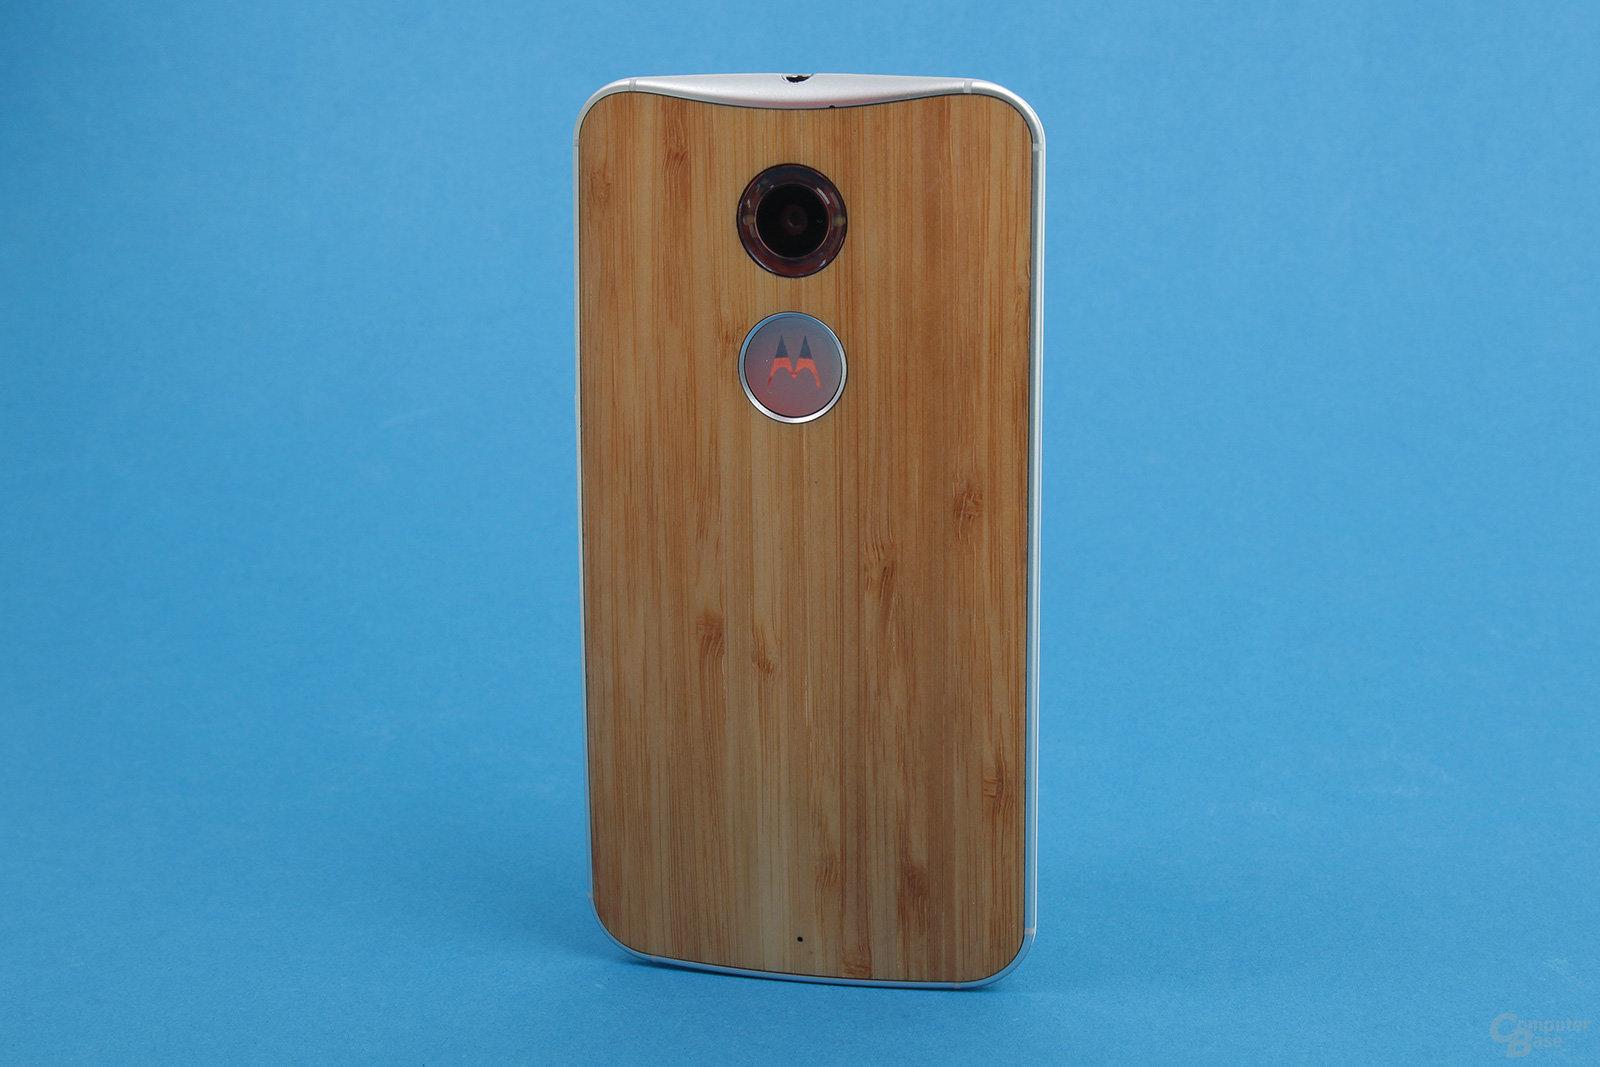 Motorola Moto X 2014 – Dank Moto-Maker Rückseite auf Wunsch aus Holz